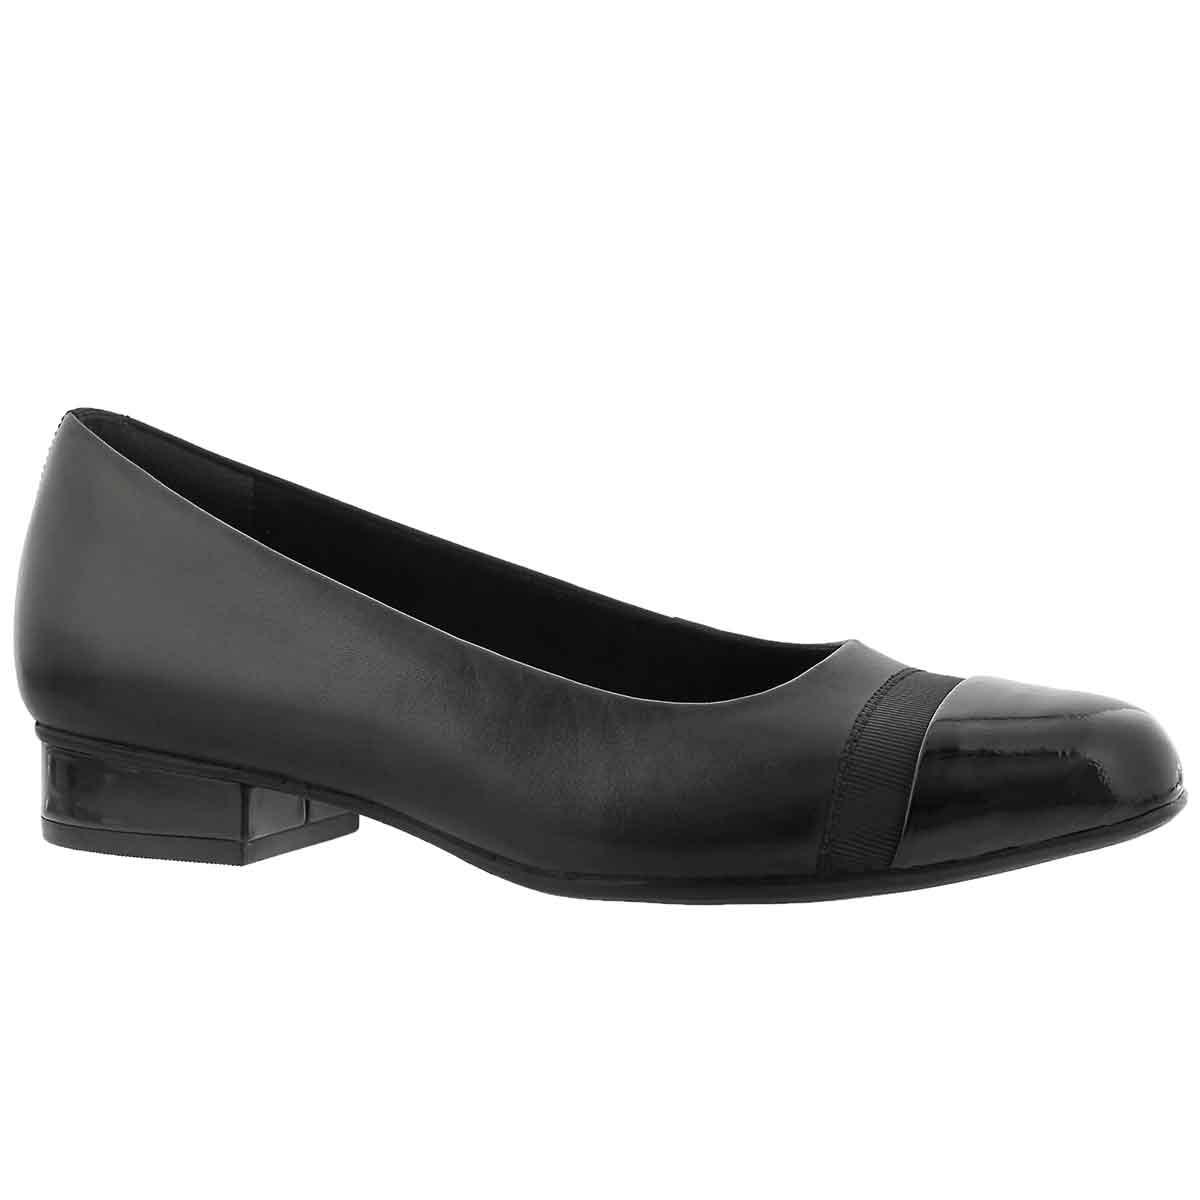 Women's KEESHA ROSA black dress heels